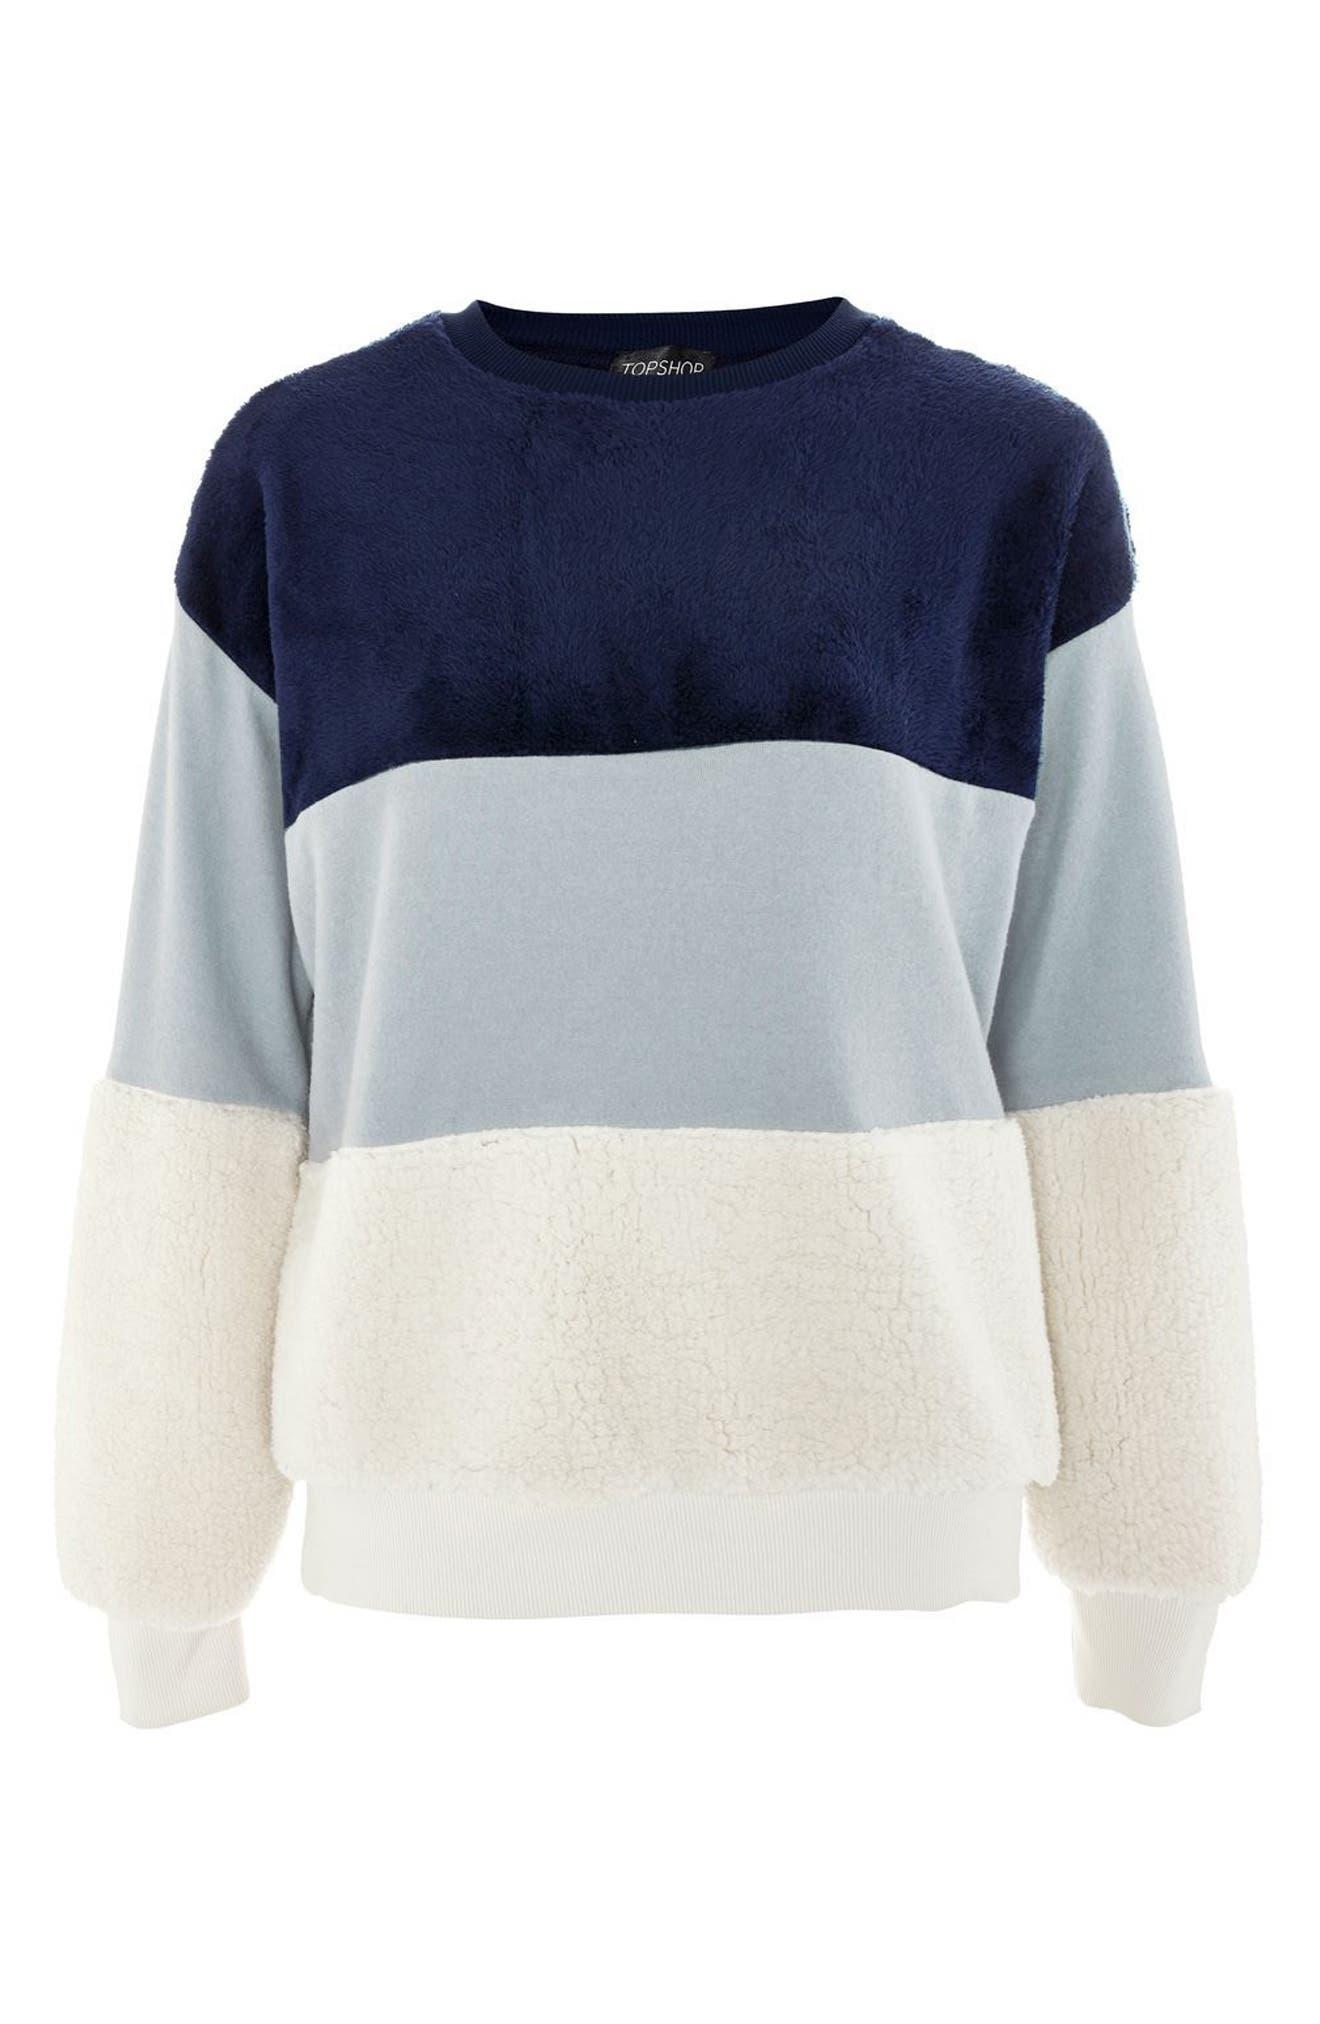 Colorblock Fleece Sweatshirt,                             Alternate thumbnail 3, color,                             410